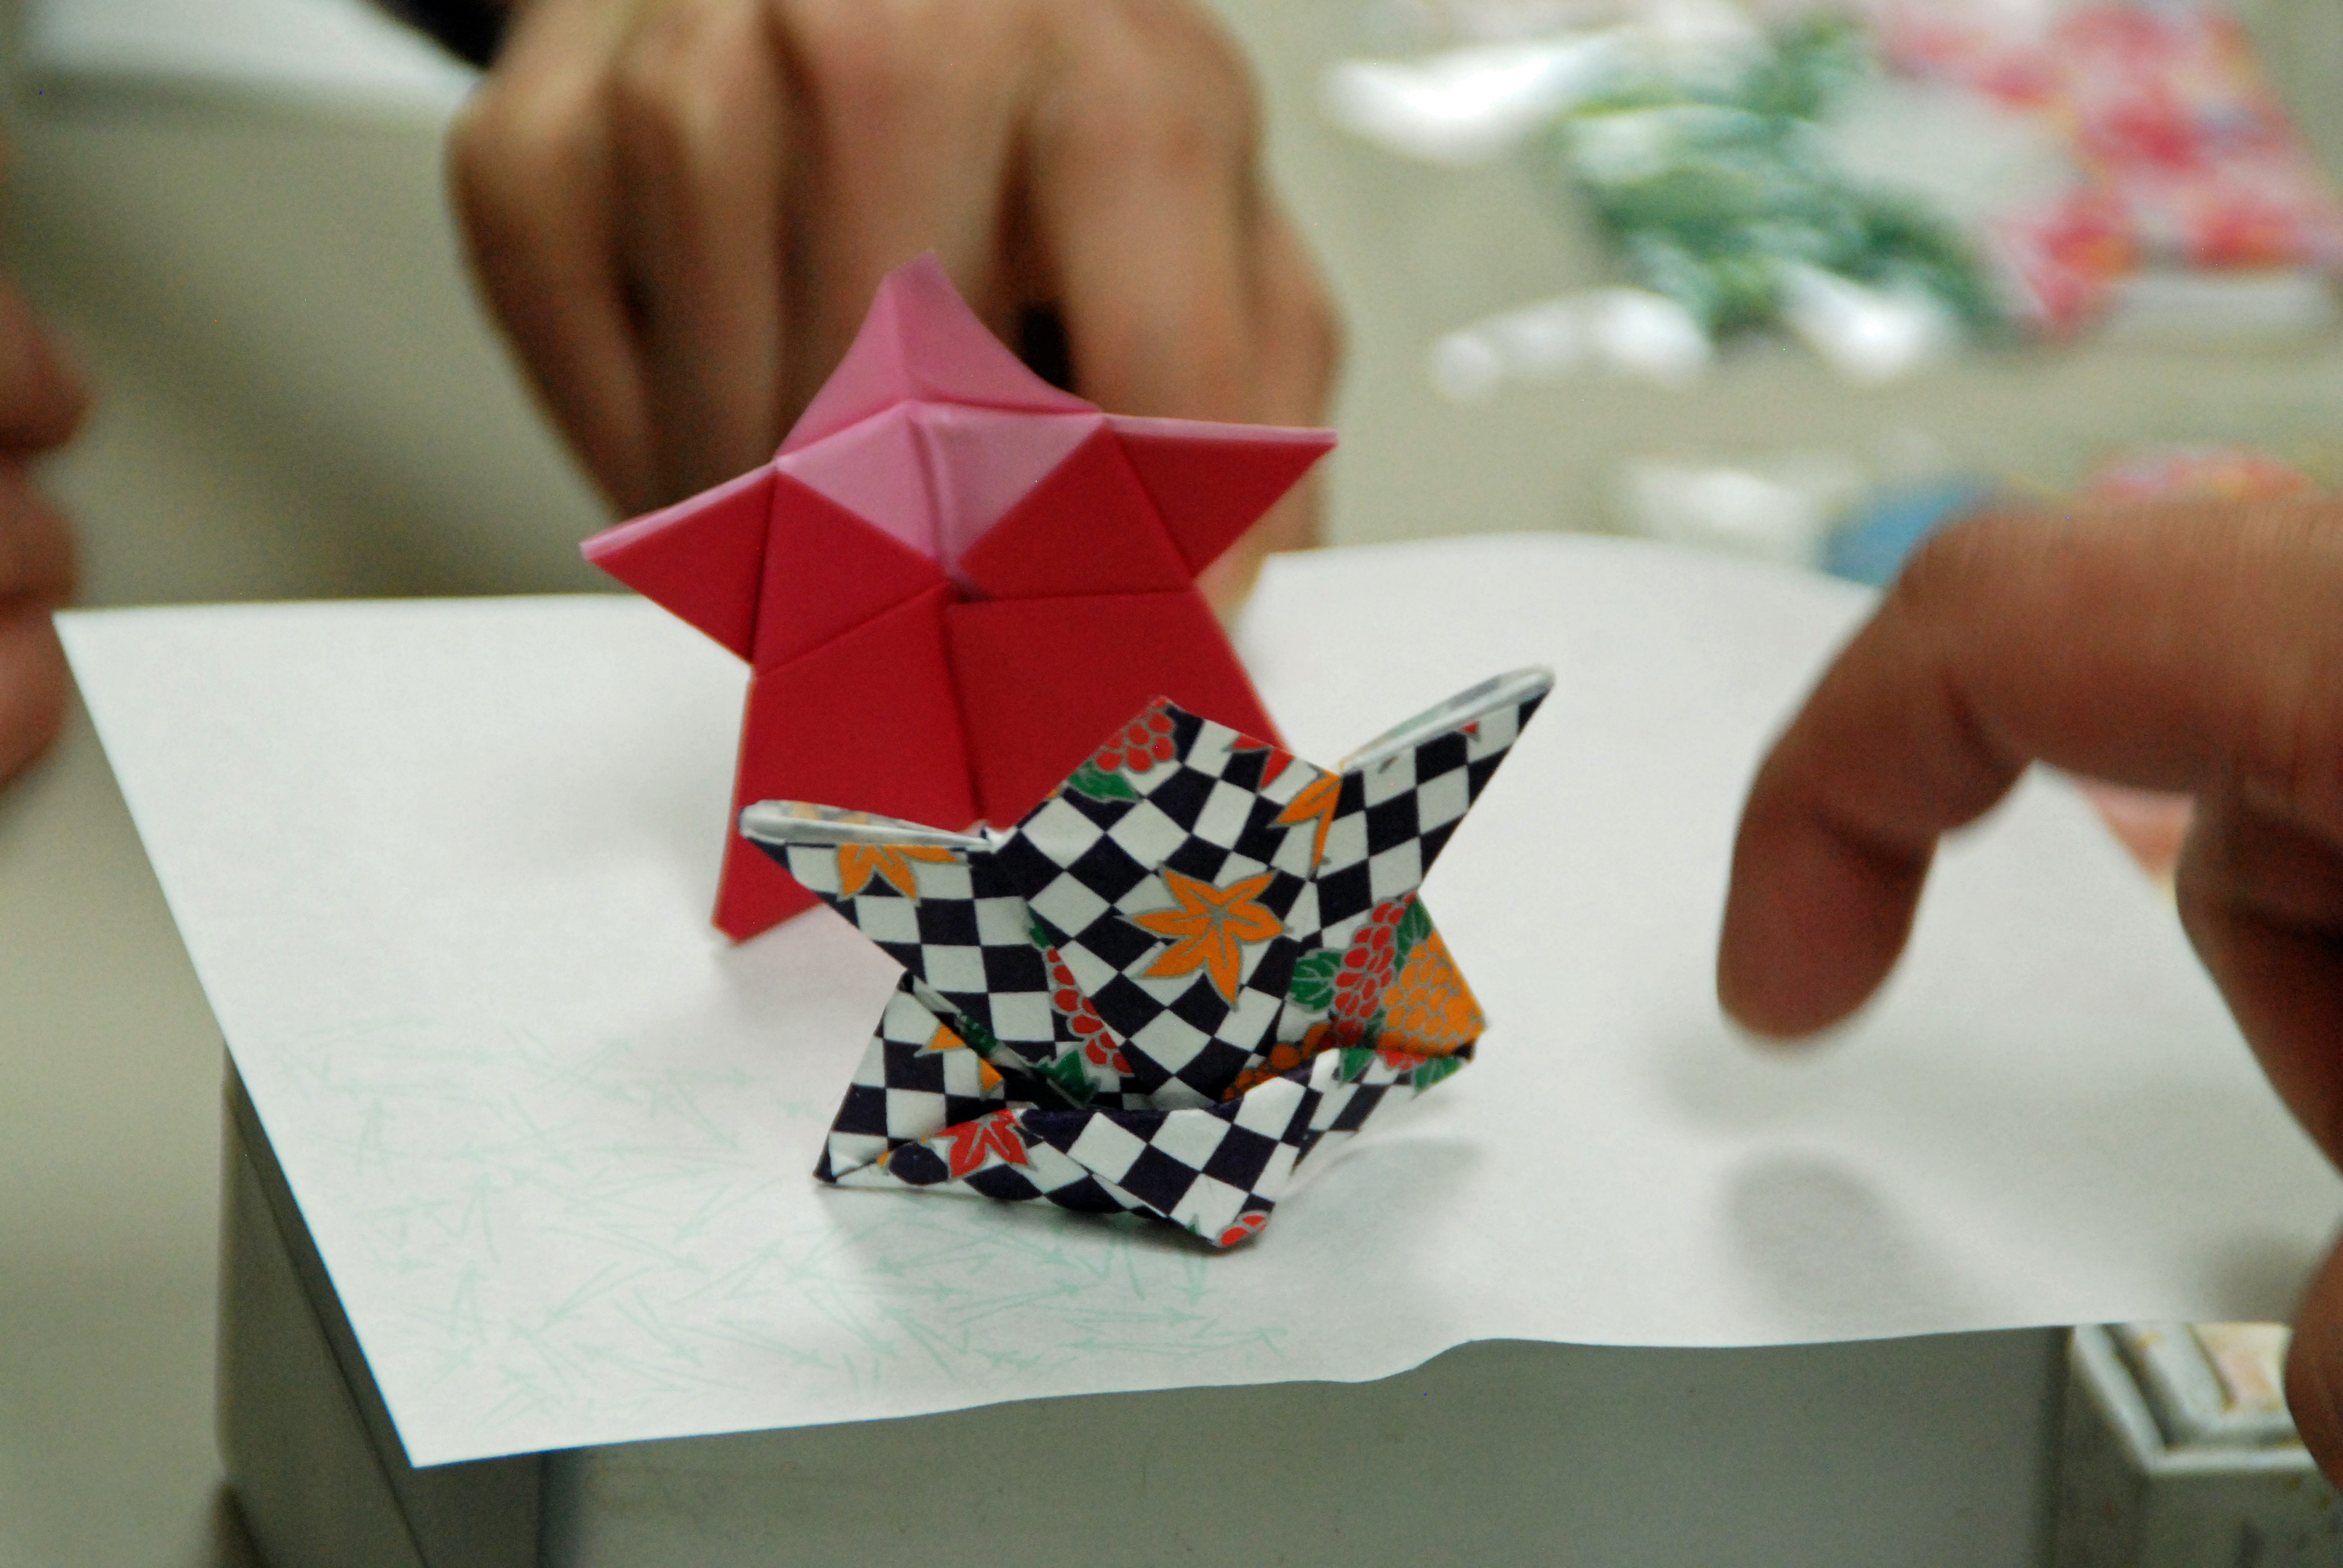 Beyond The Leaf Tea Enthusiast Industry Blog Origami Nut Spring Fighting Sumo Wrestlers